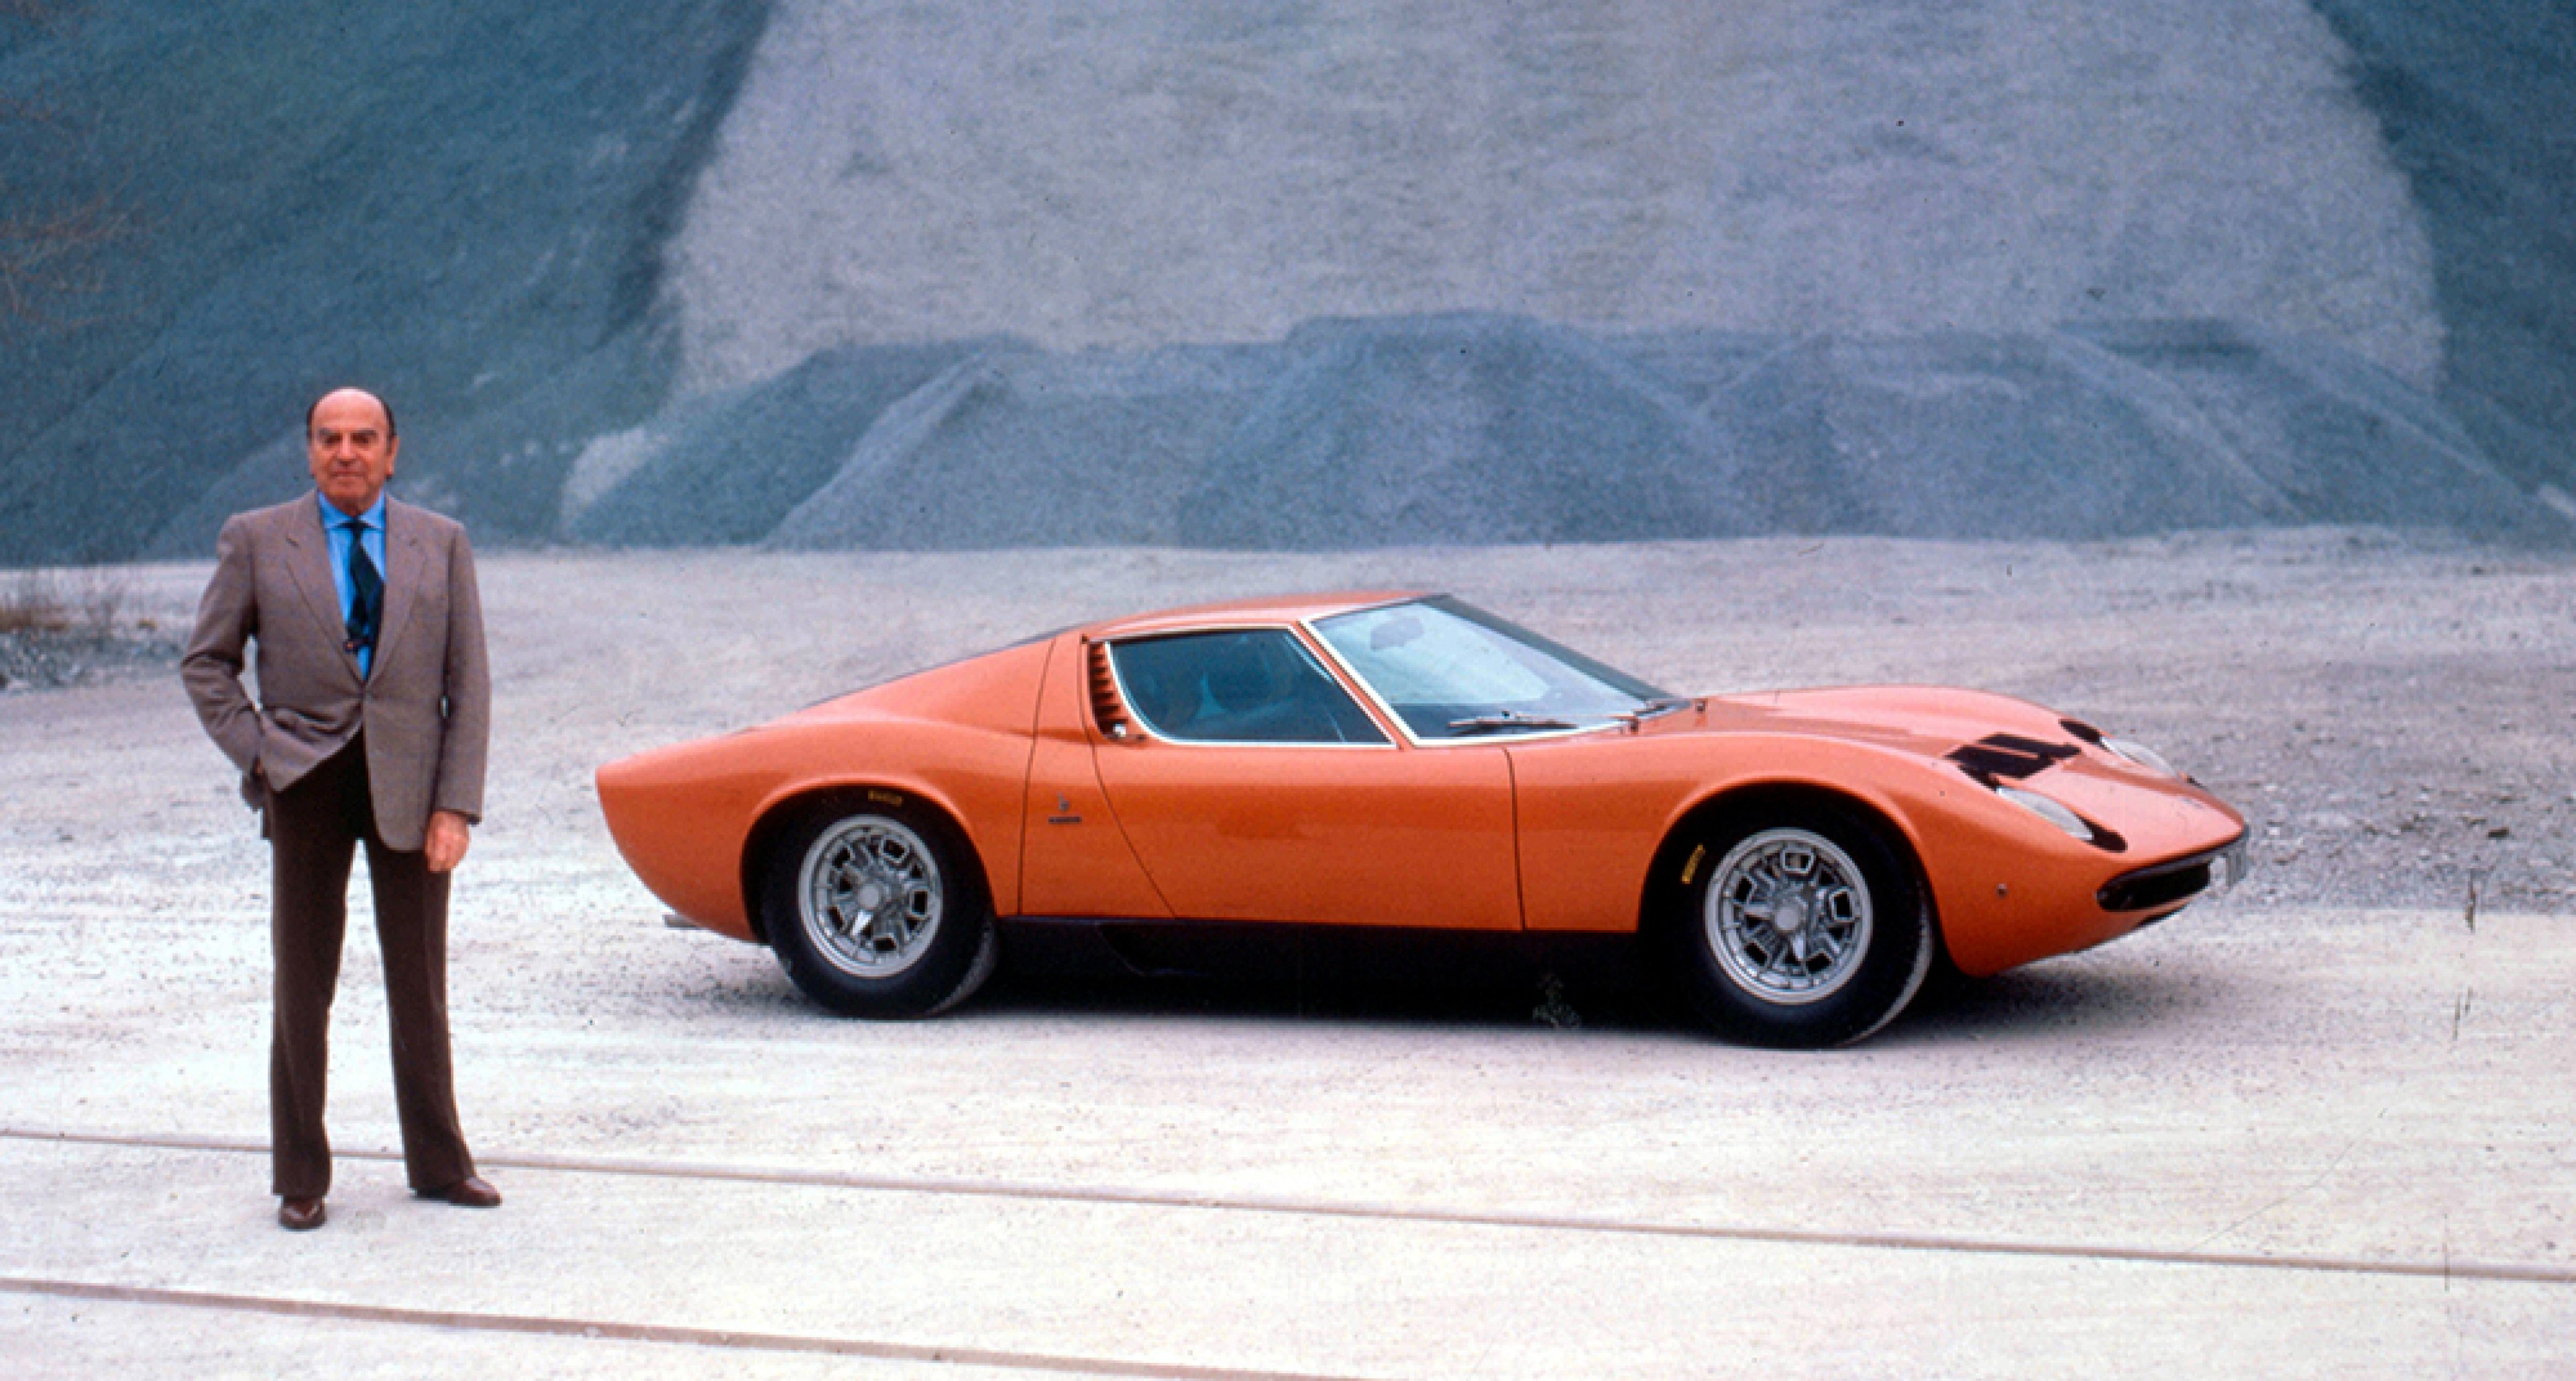 Nuccio Bertone and the Lamborghini Miura. © Rexfeatures